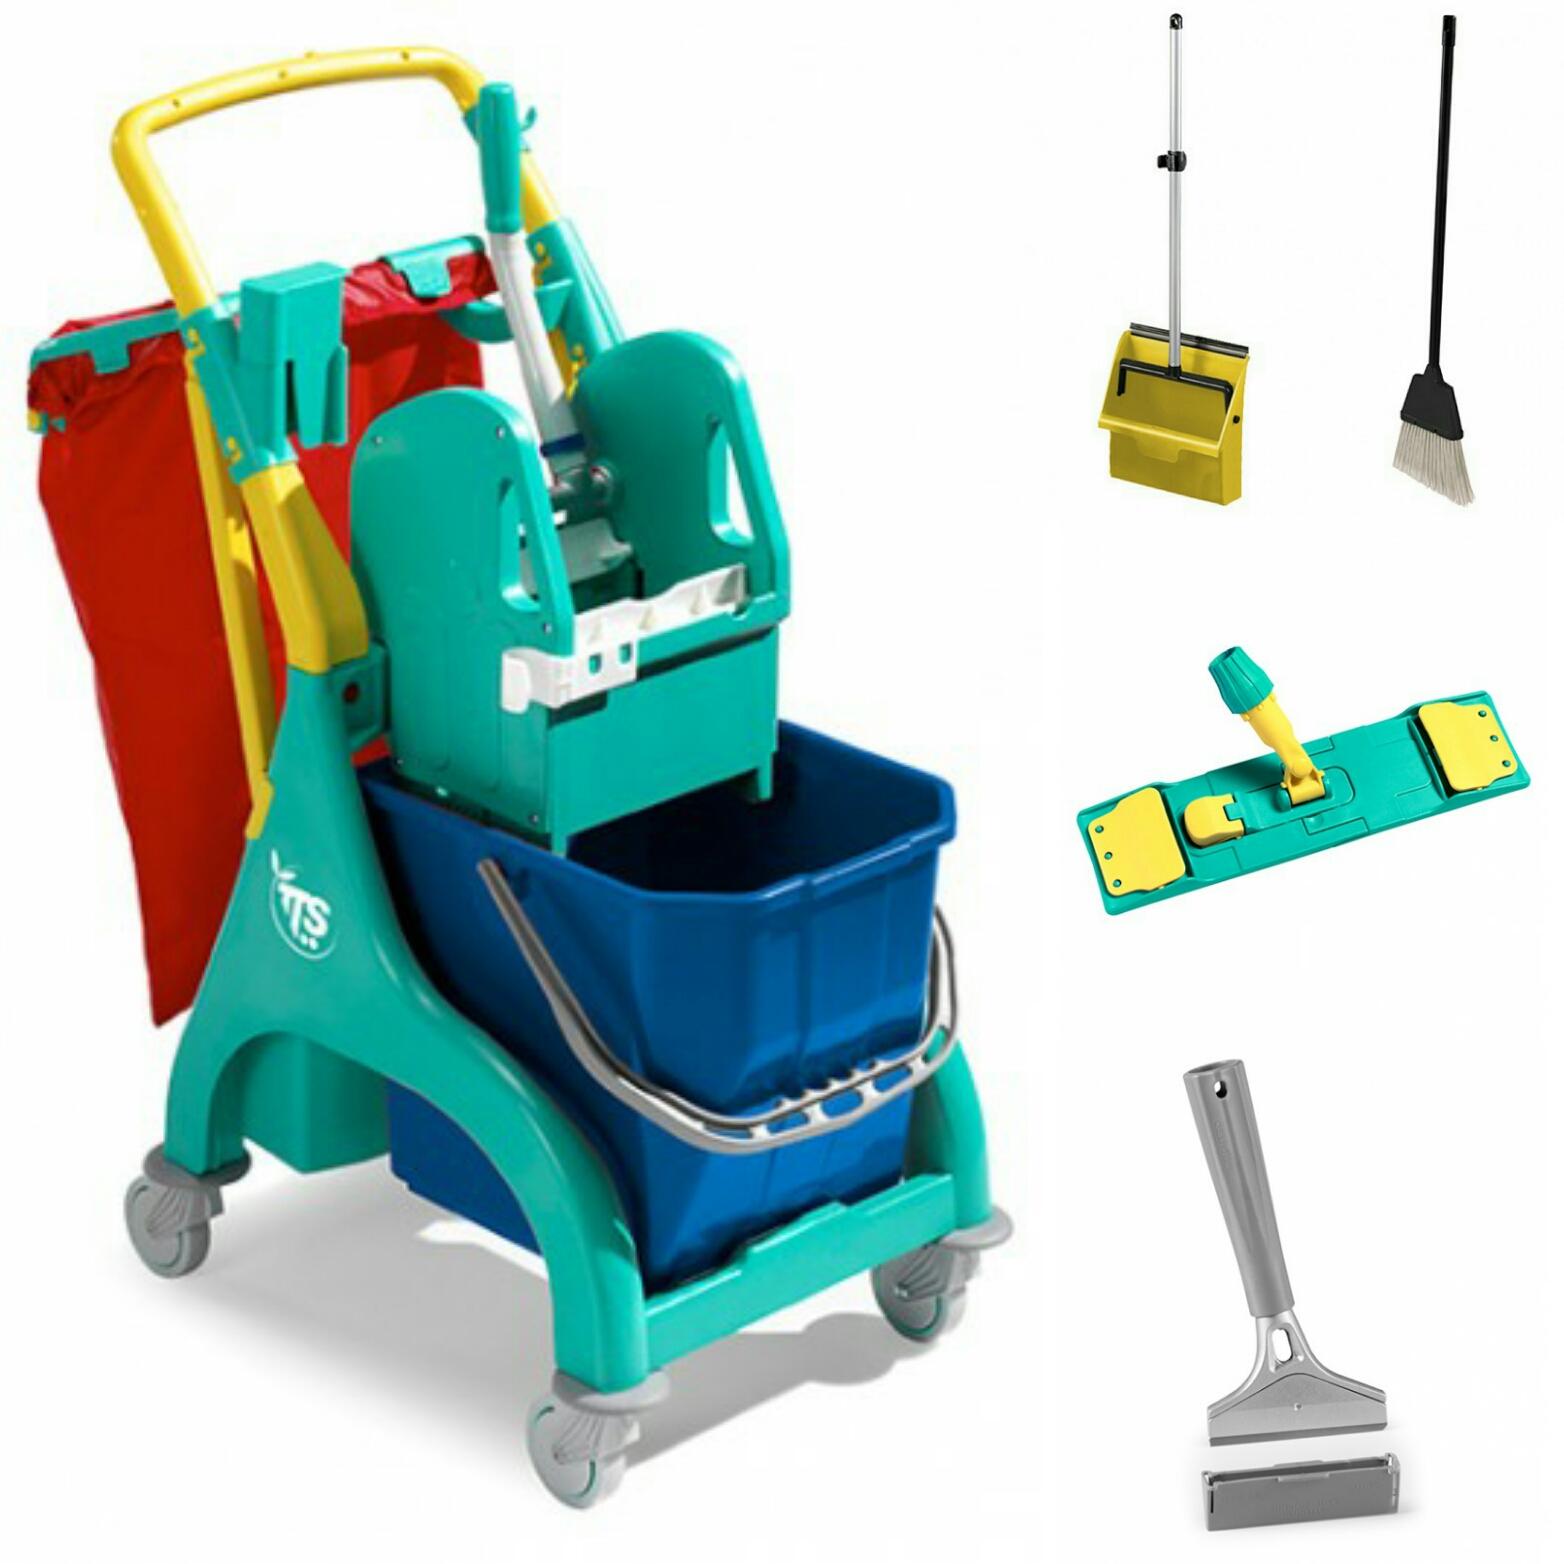 Ce echipamente de curatenie profesionale am nevoie ca sa imi deschid o firma de curatenie?